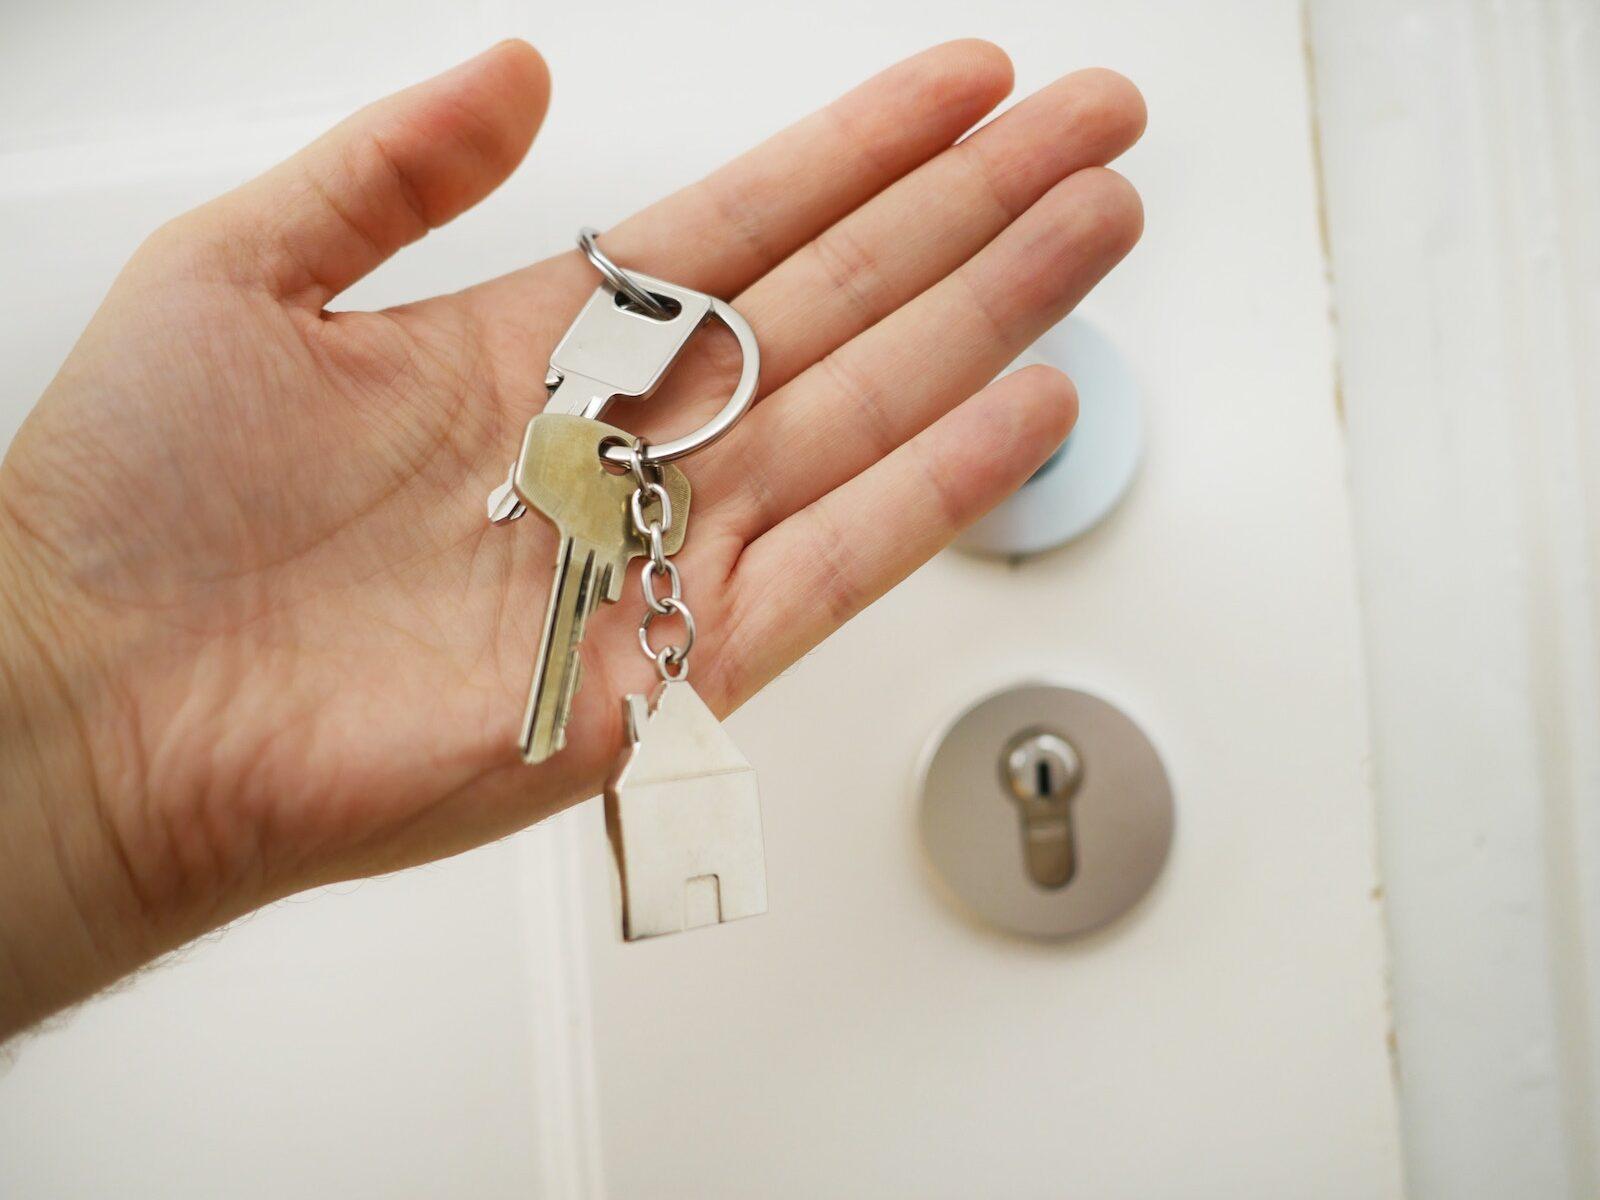 homeownership benefits of